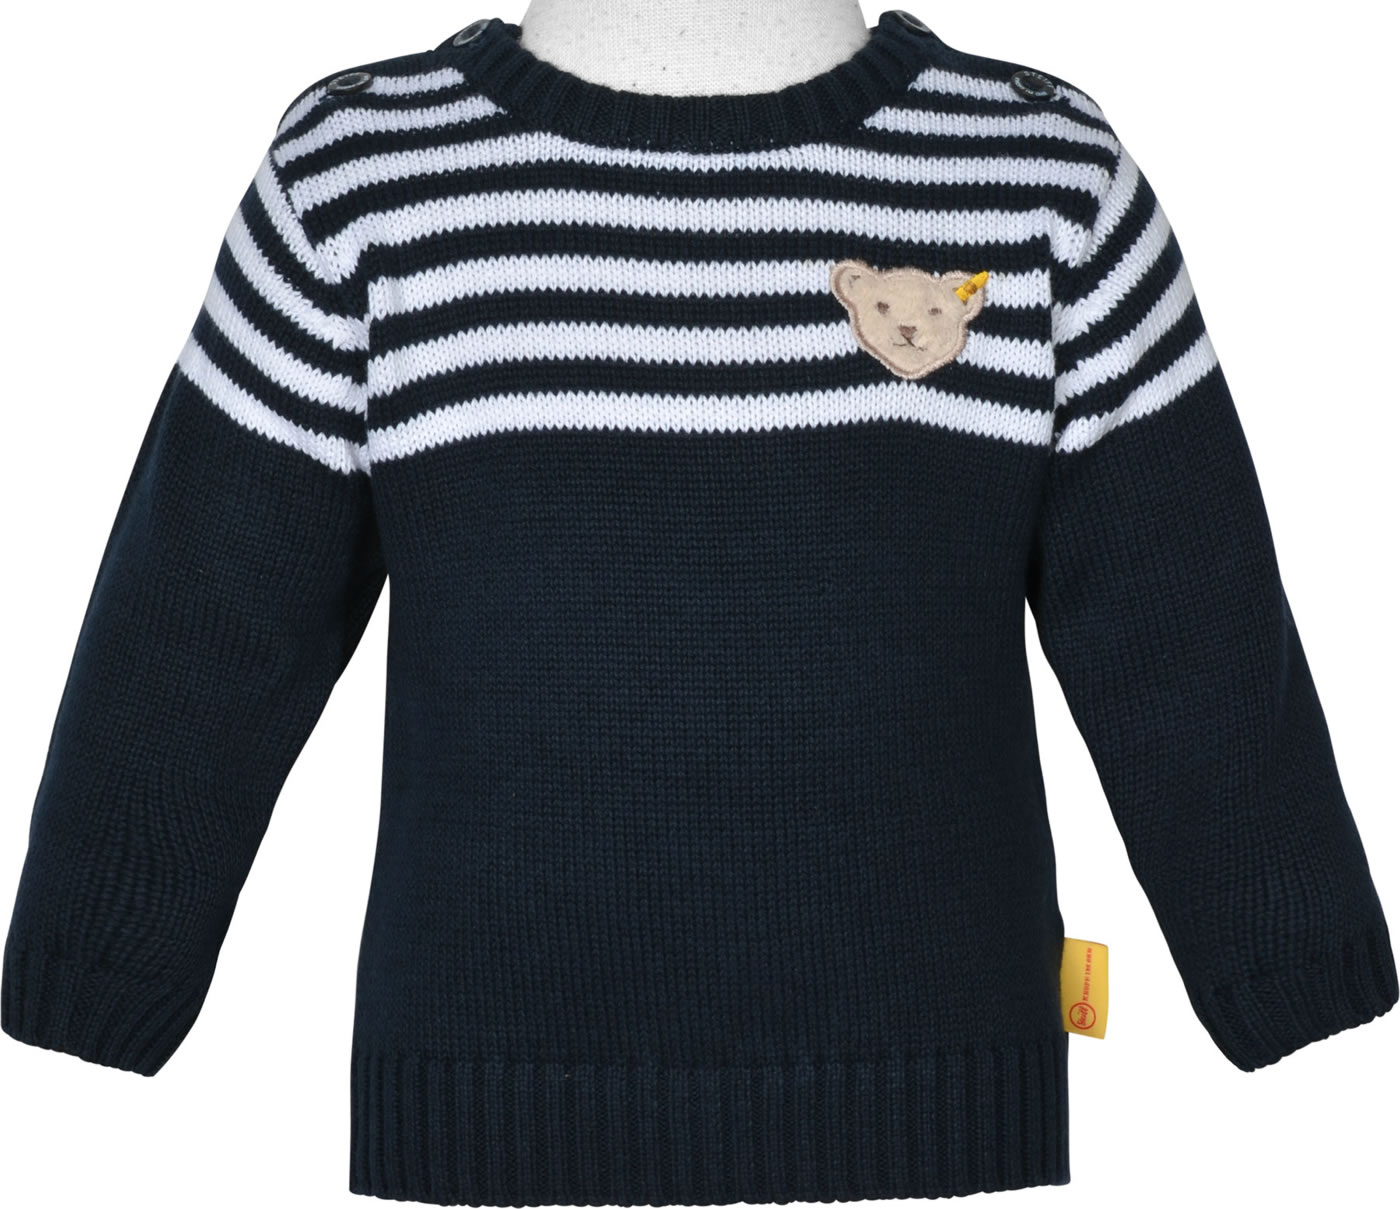 premium selection 106b4 a3b9f Steiff Pullover BLUE WINTER black iris 1922102-3032